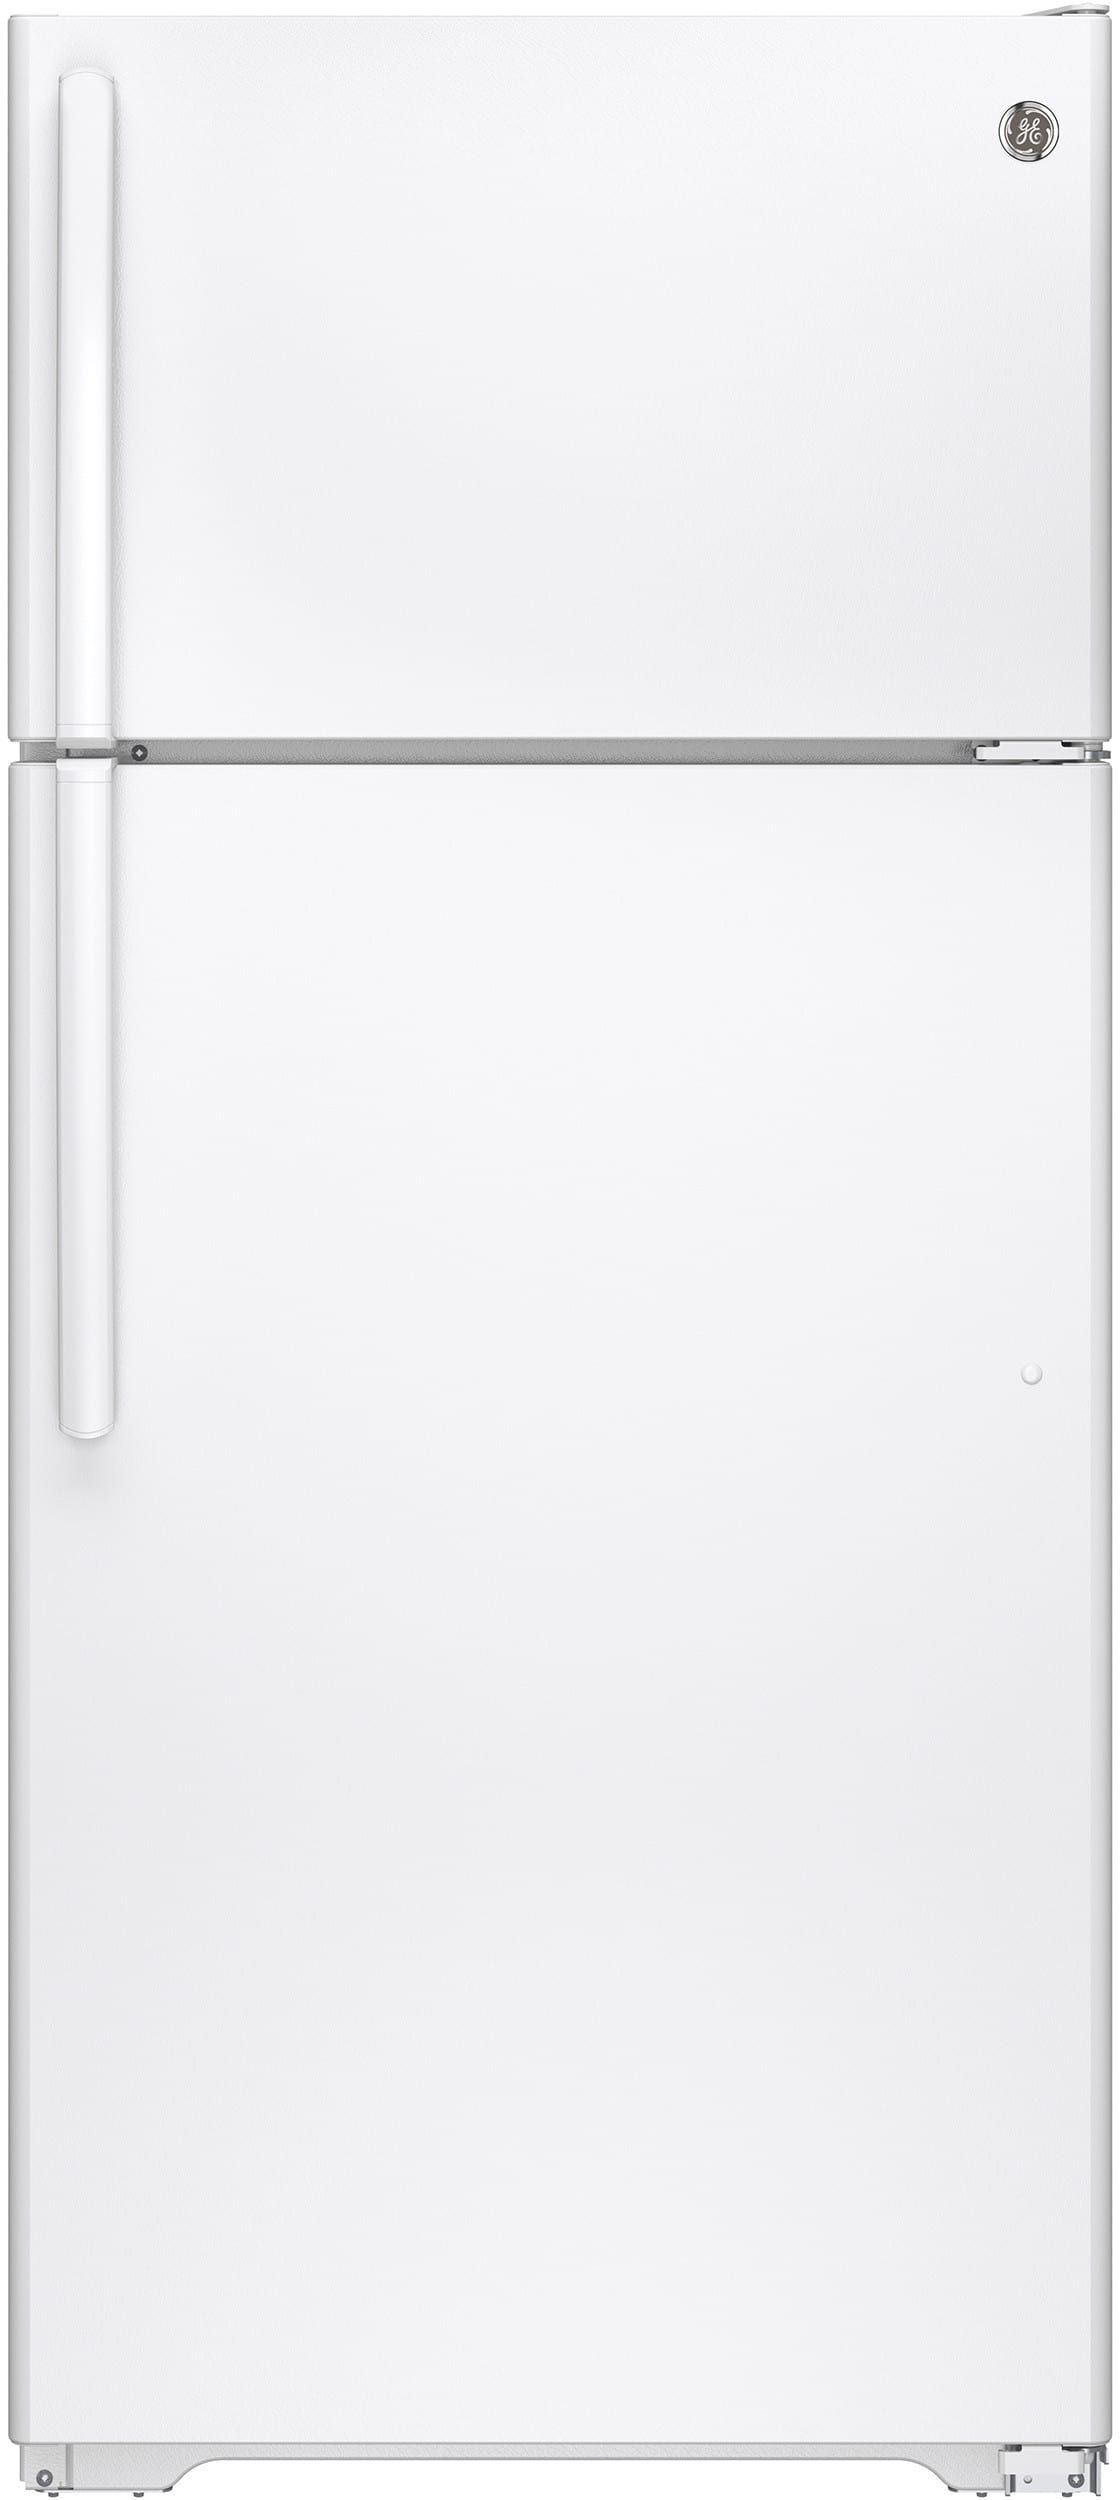 GE GTE16GTHWW 28 Inch TopFreezer Refrigerator with Snack